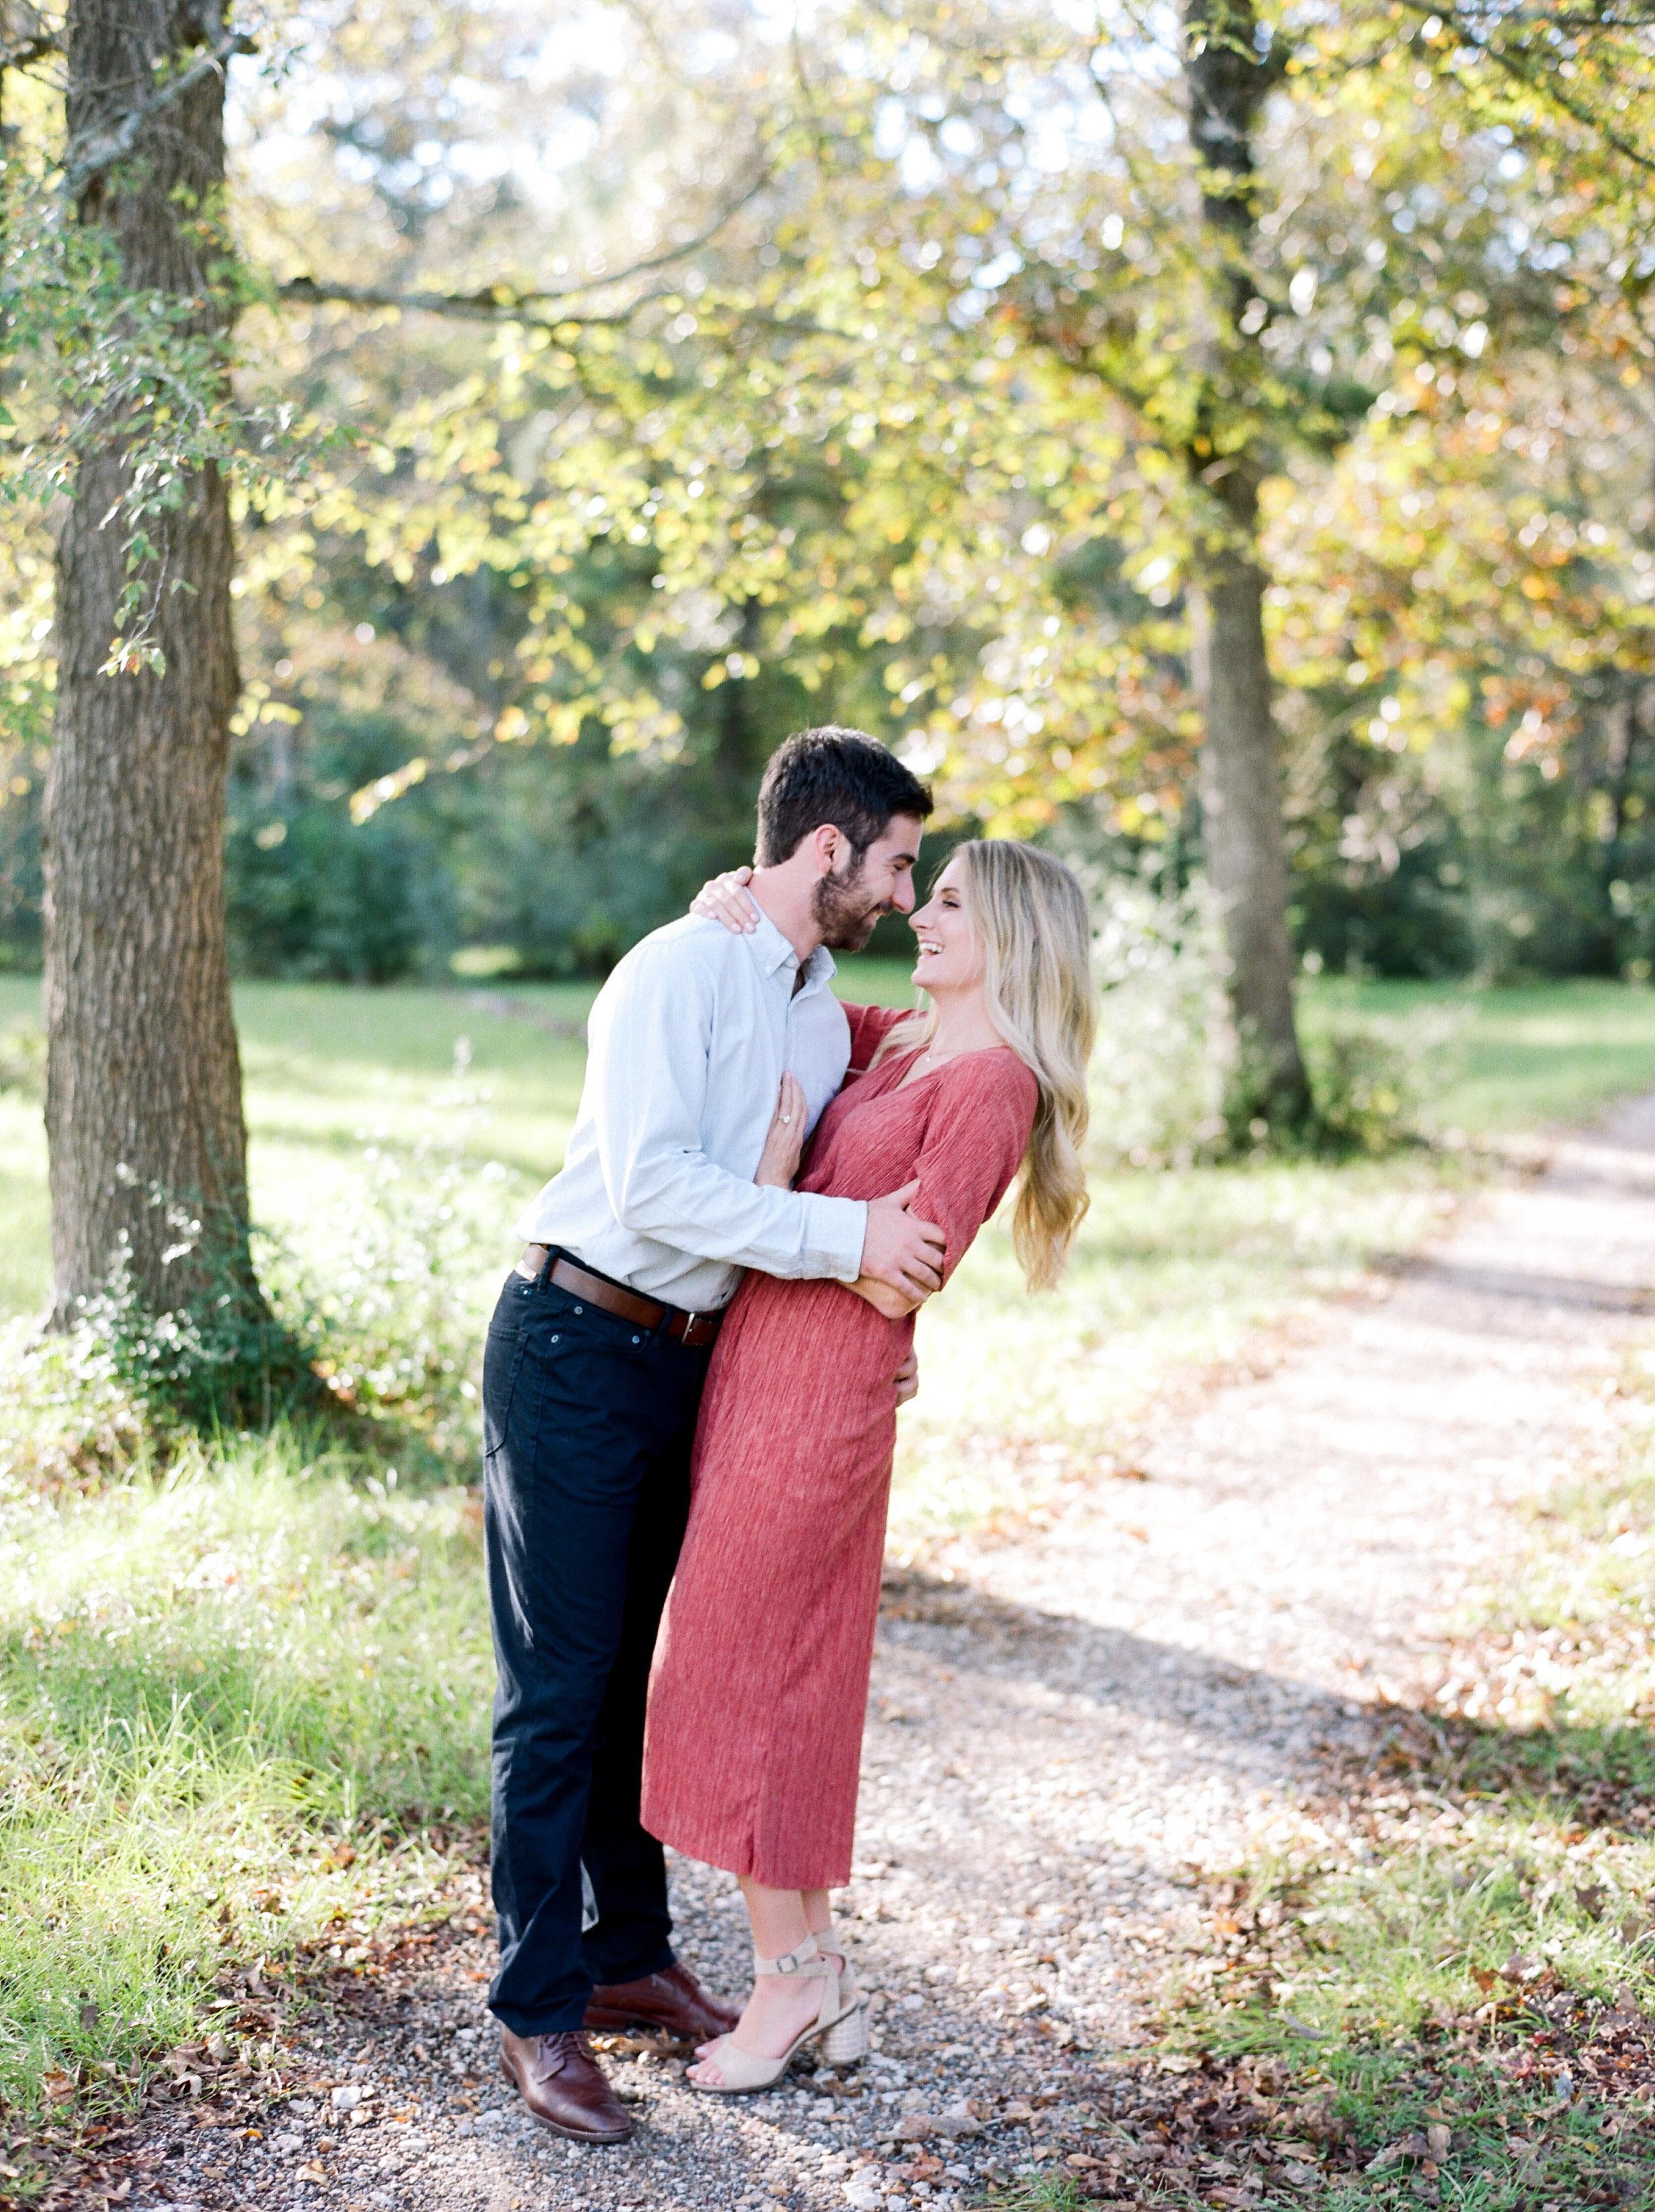 Houston-Wedding-Photographer-Best-Top-Luxury-Destination-Engagements-Portrait-Austin-Photography-4.jpg